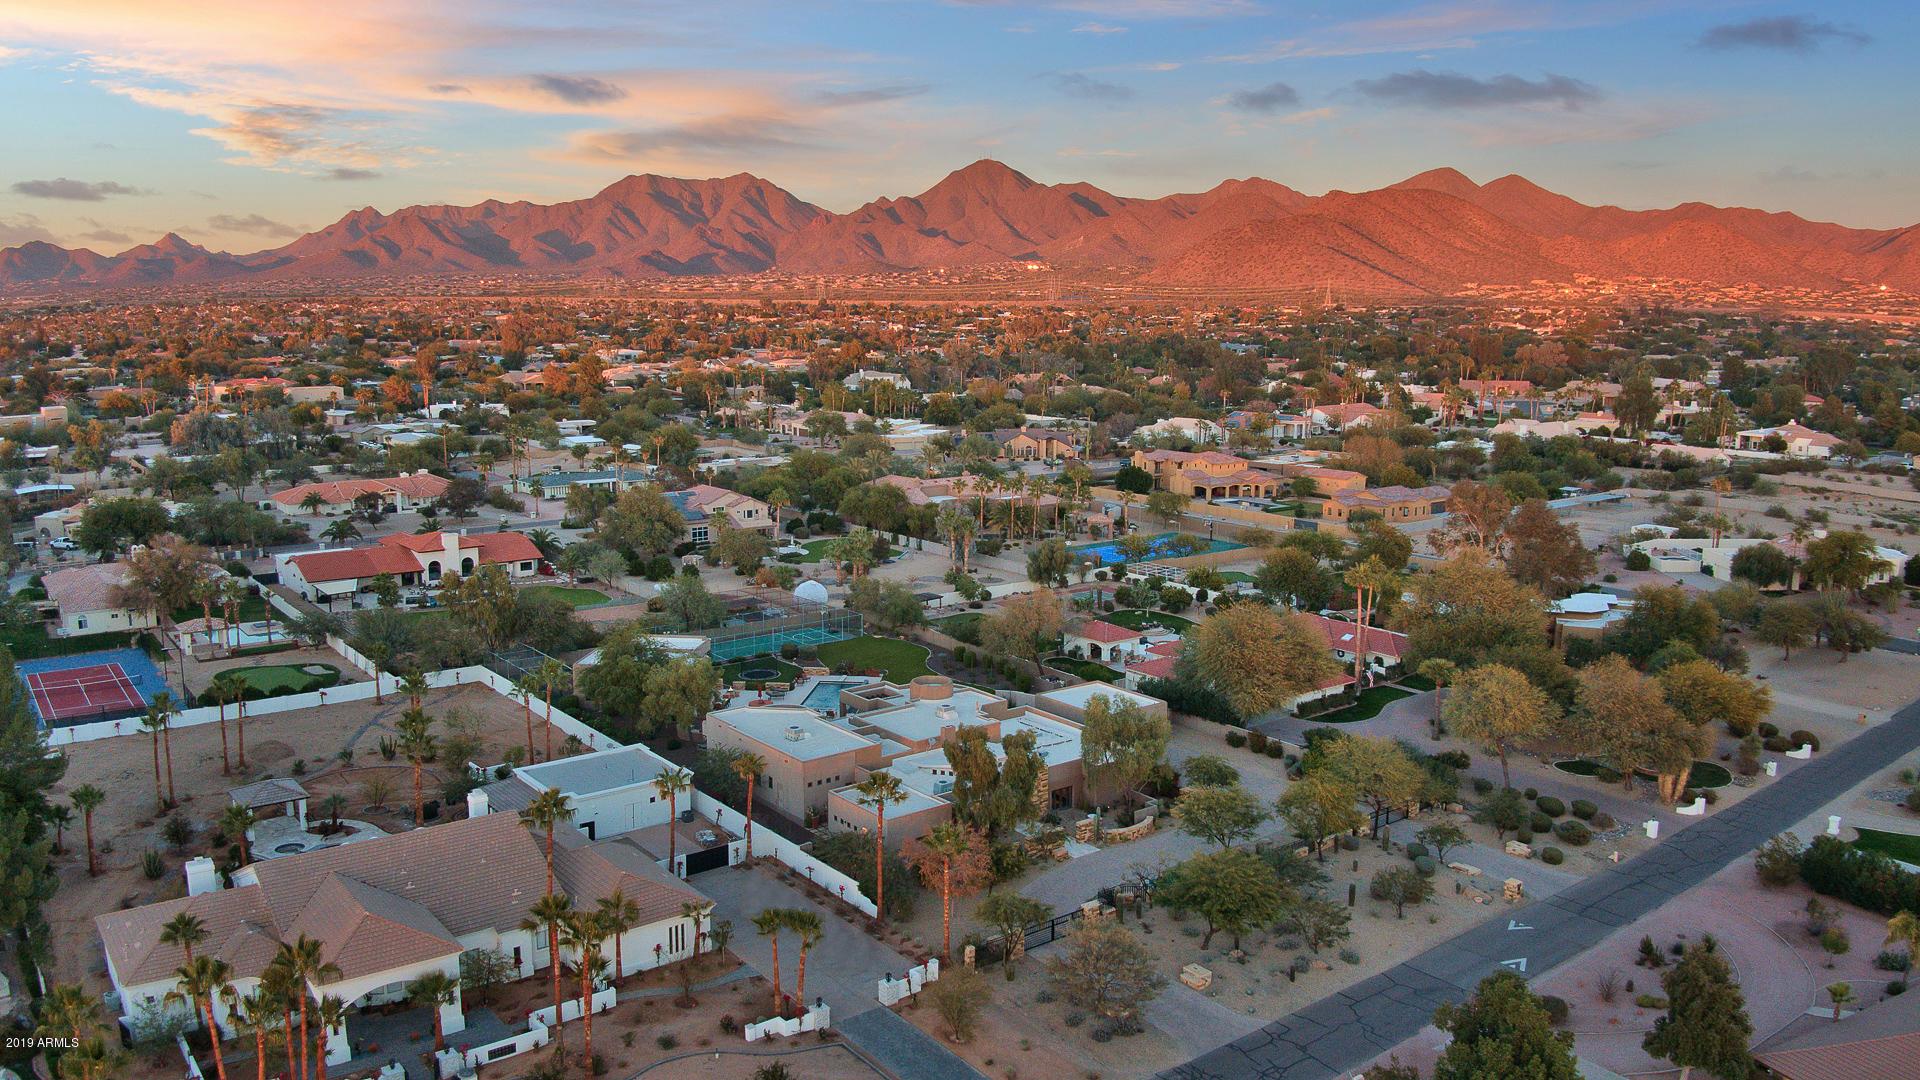 MLS 5862446 10010 E Cholla Street, Scottsdale, AZ 85260 Scottsdale AZ Private Pool